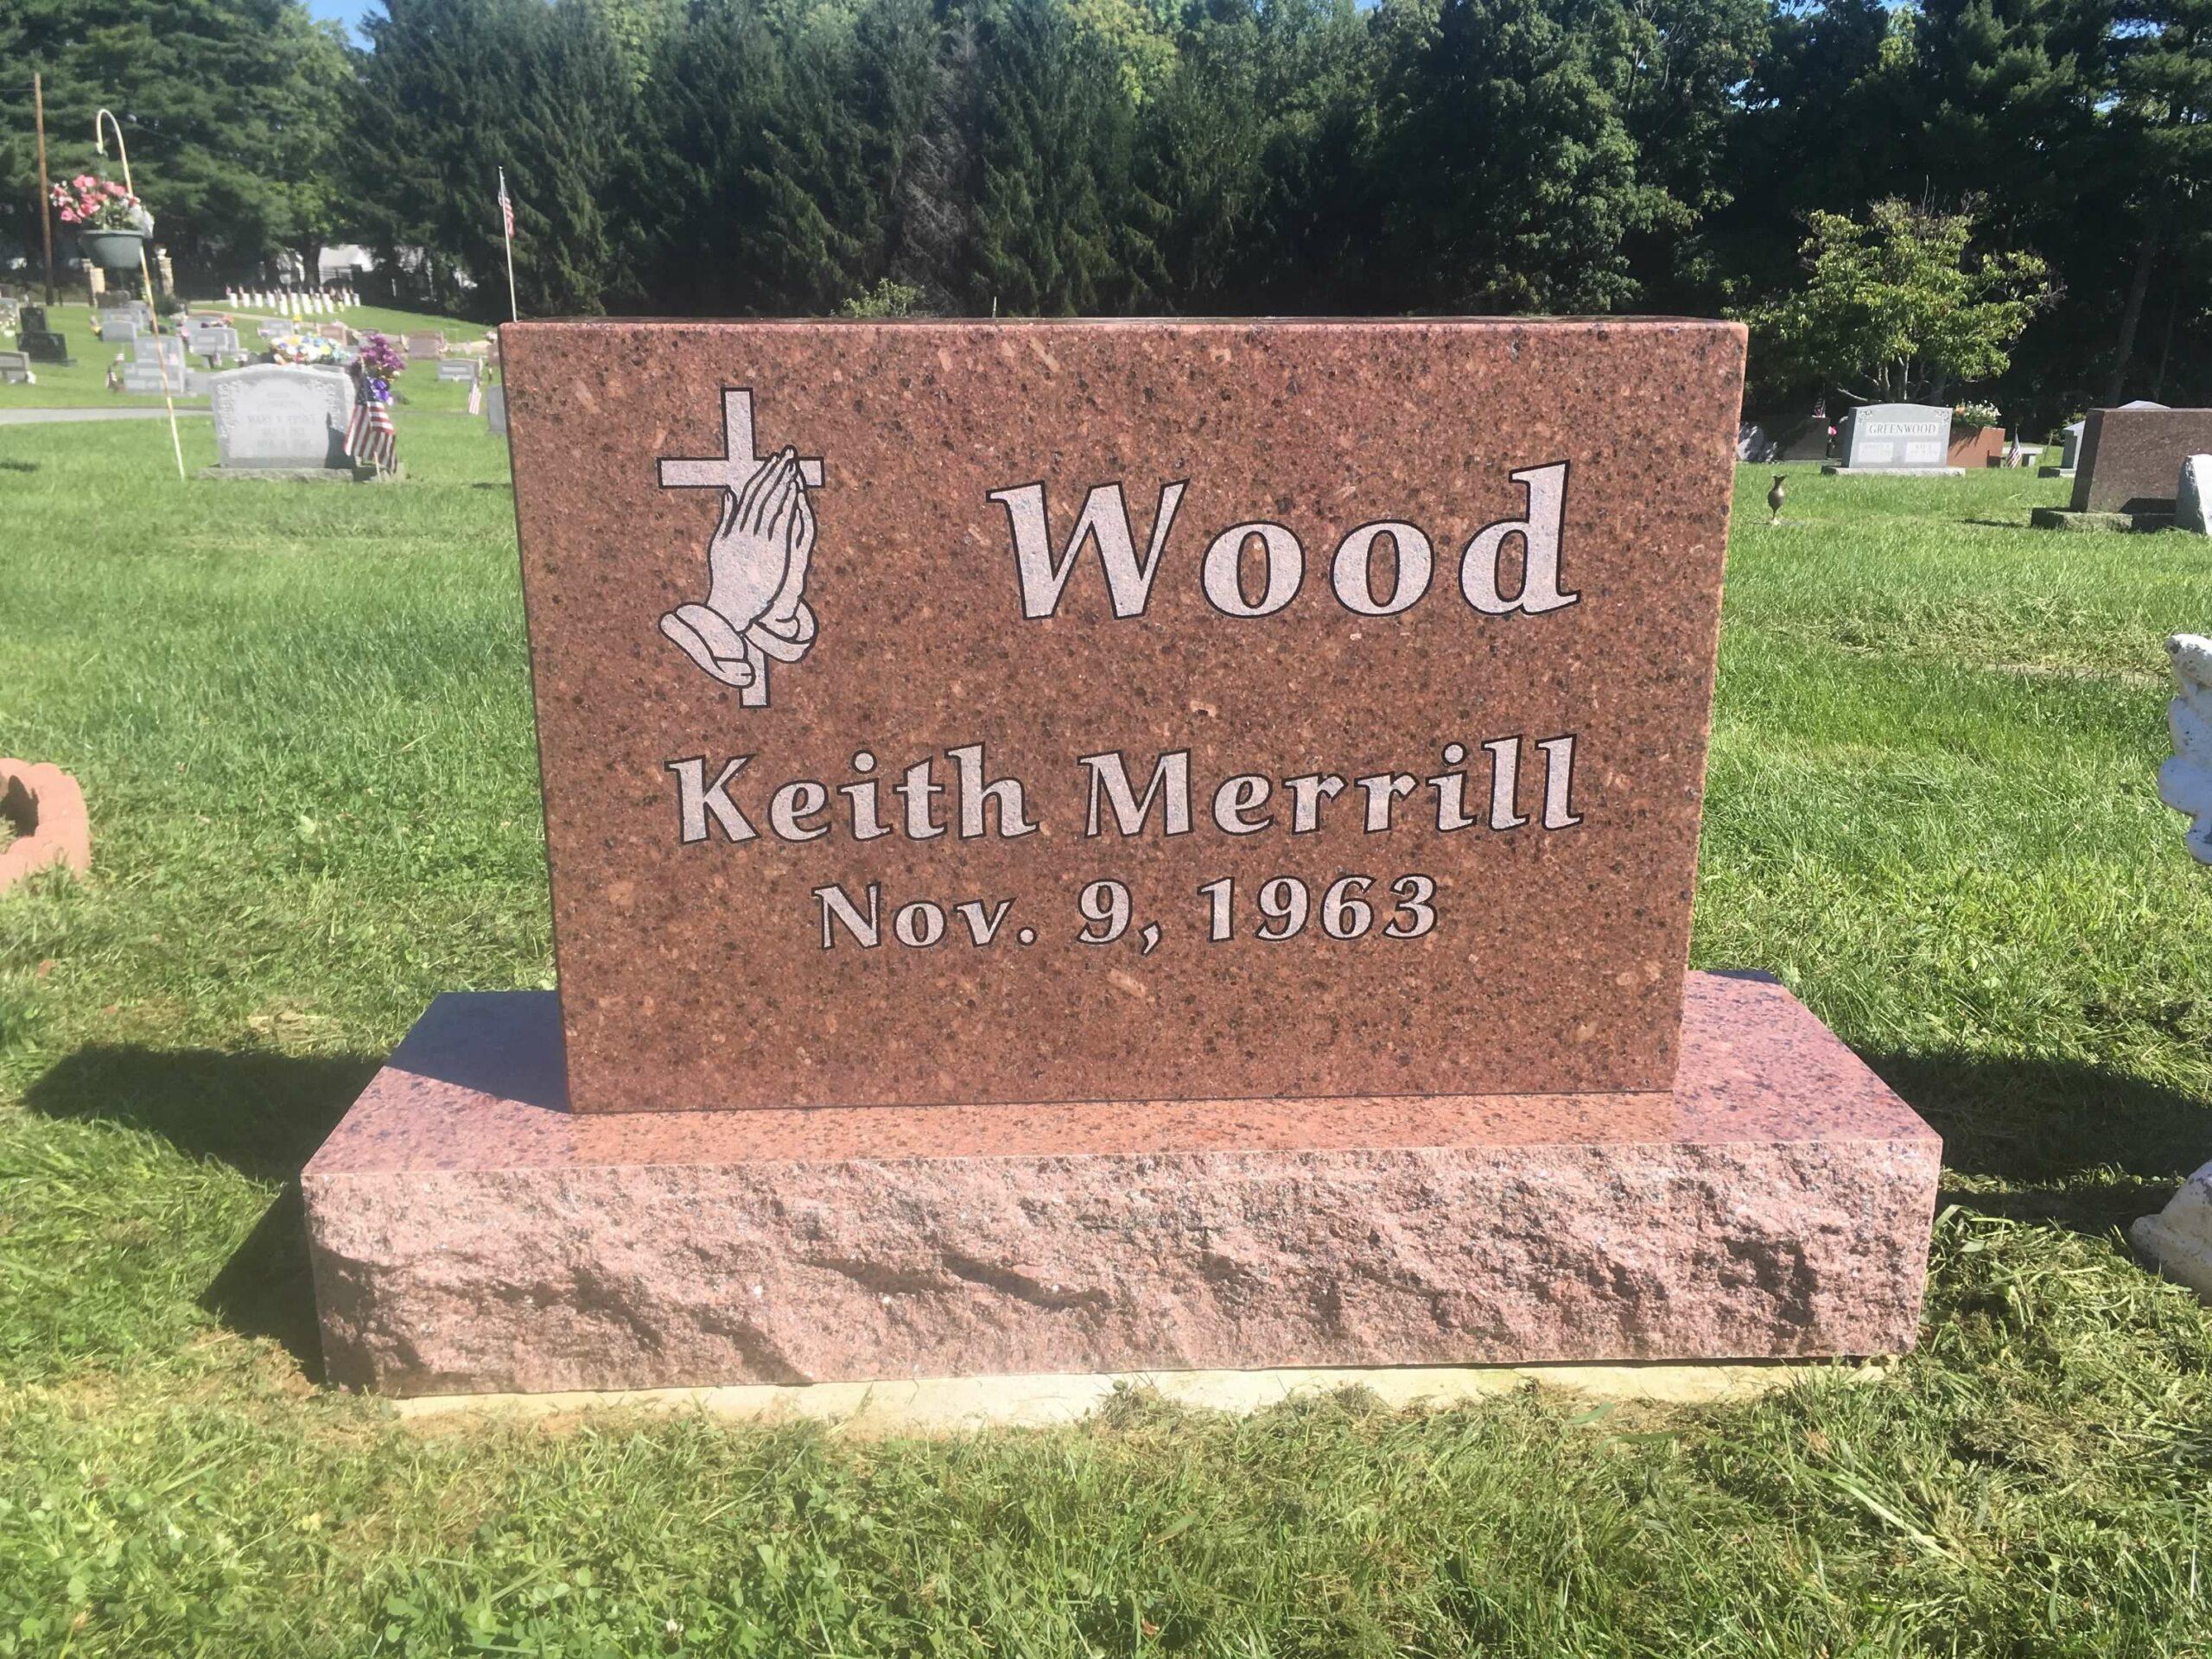 Wood, Keith - Northwood, 2-6, Missouri Red